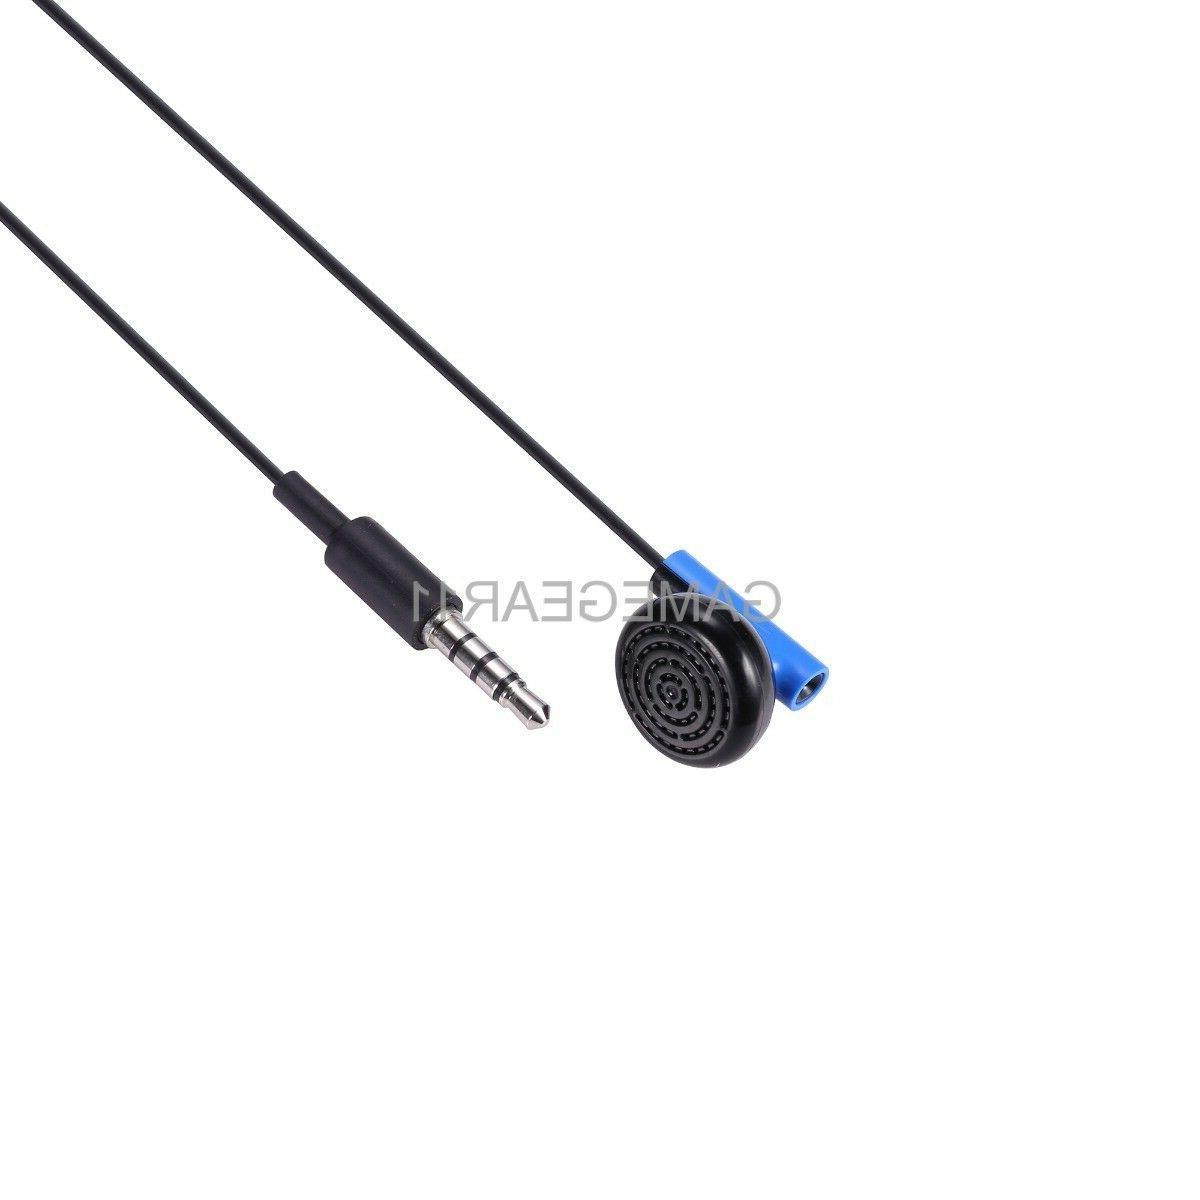 Sony Playstation 4 PS4 Headset Earbud Microphone Earpiece